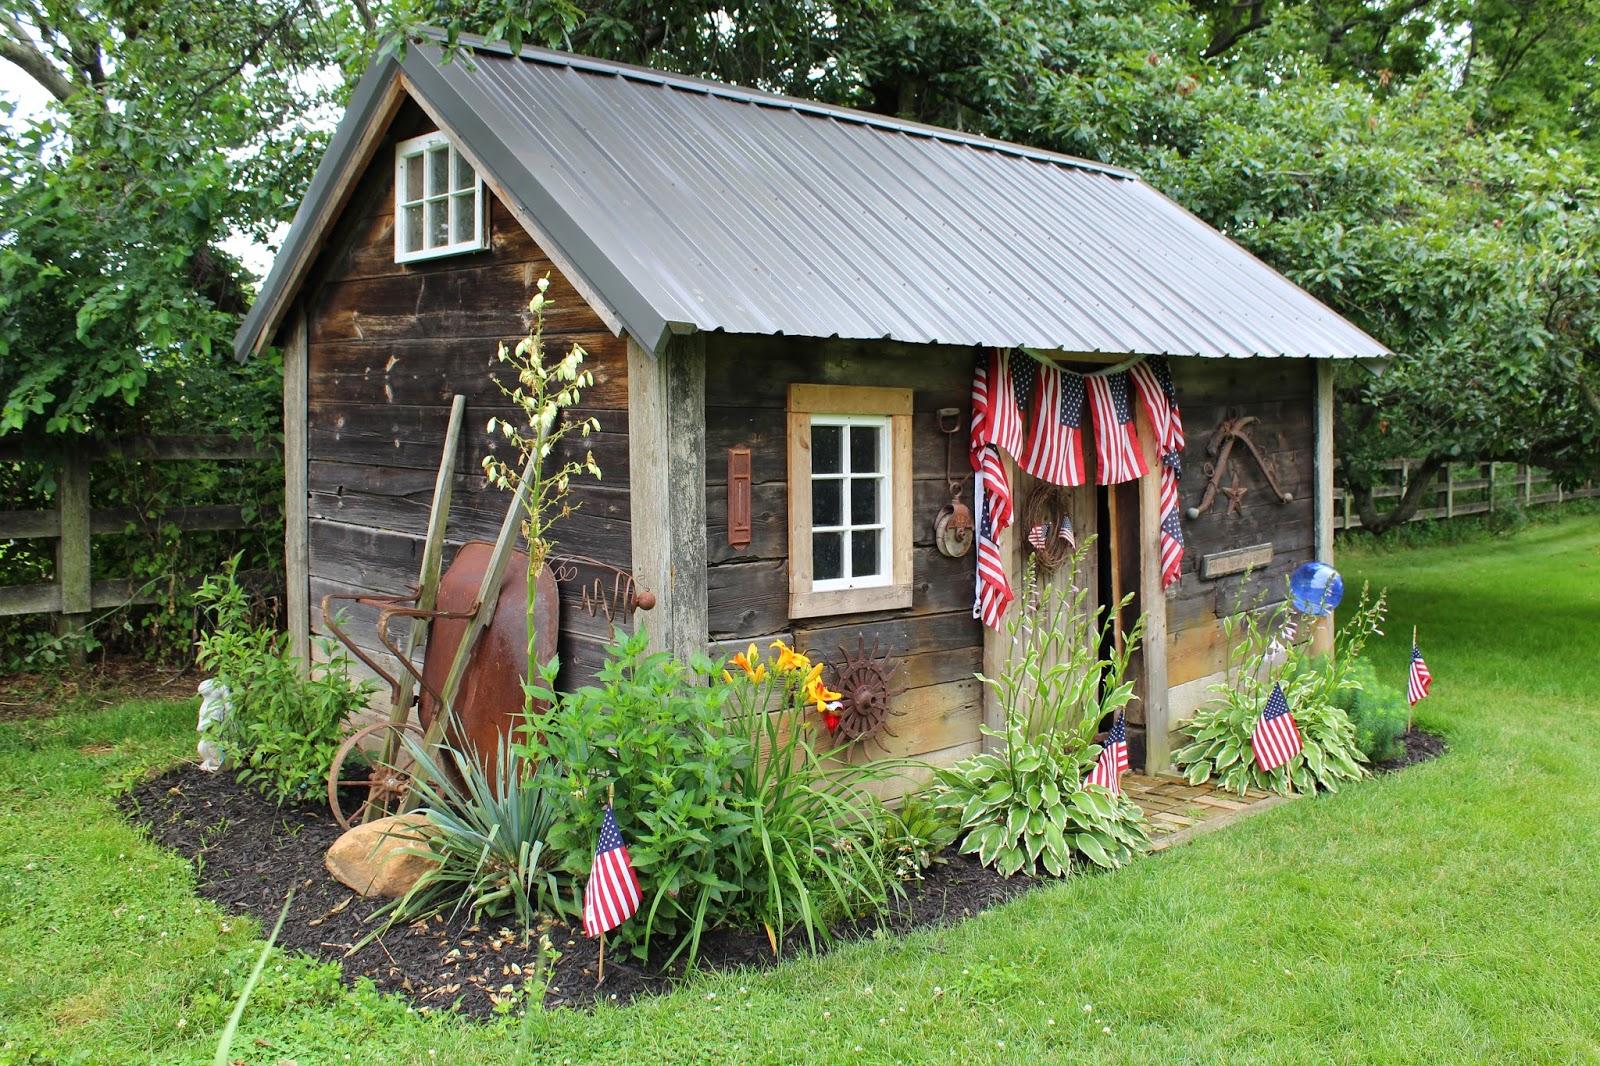 Ohio Thoughts Restoration Of Original Chicken Coop